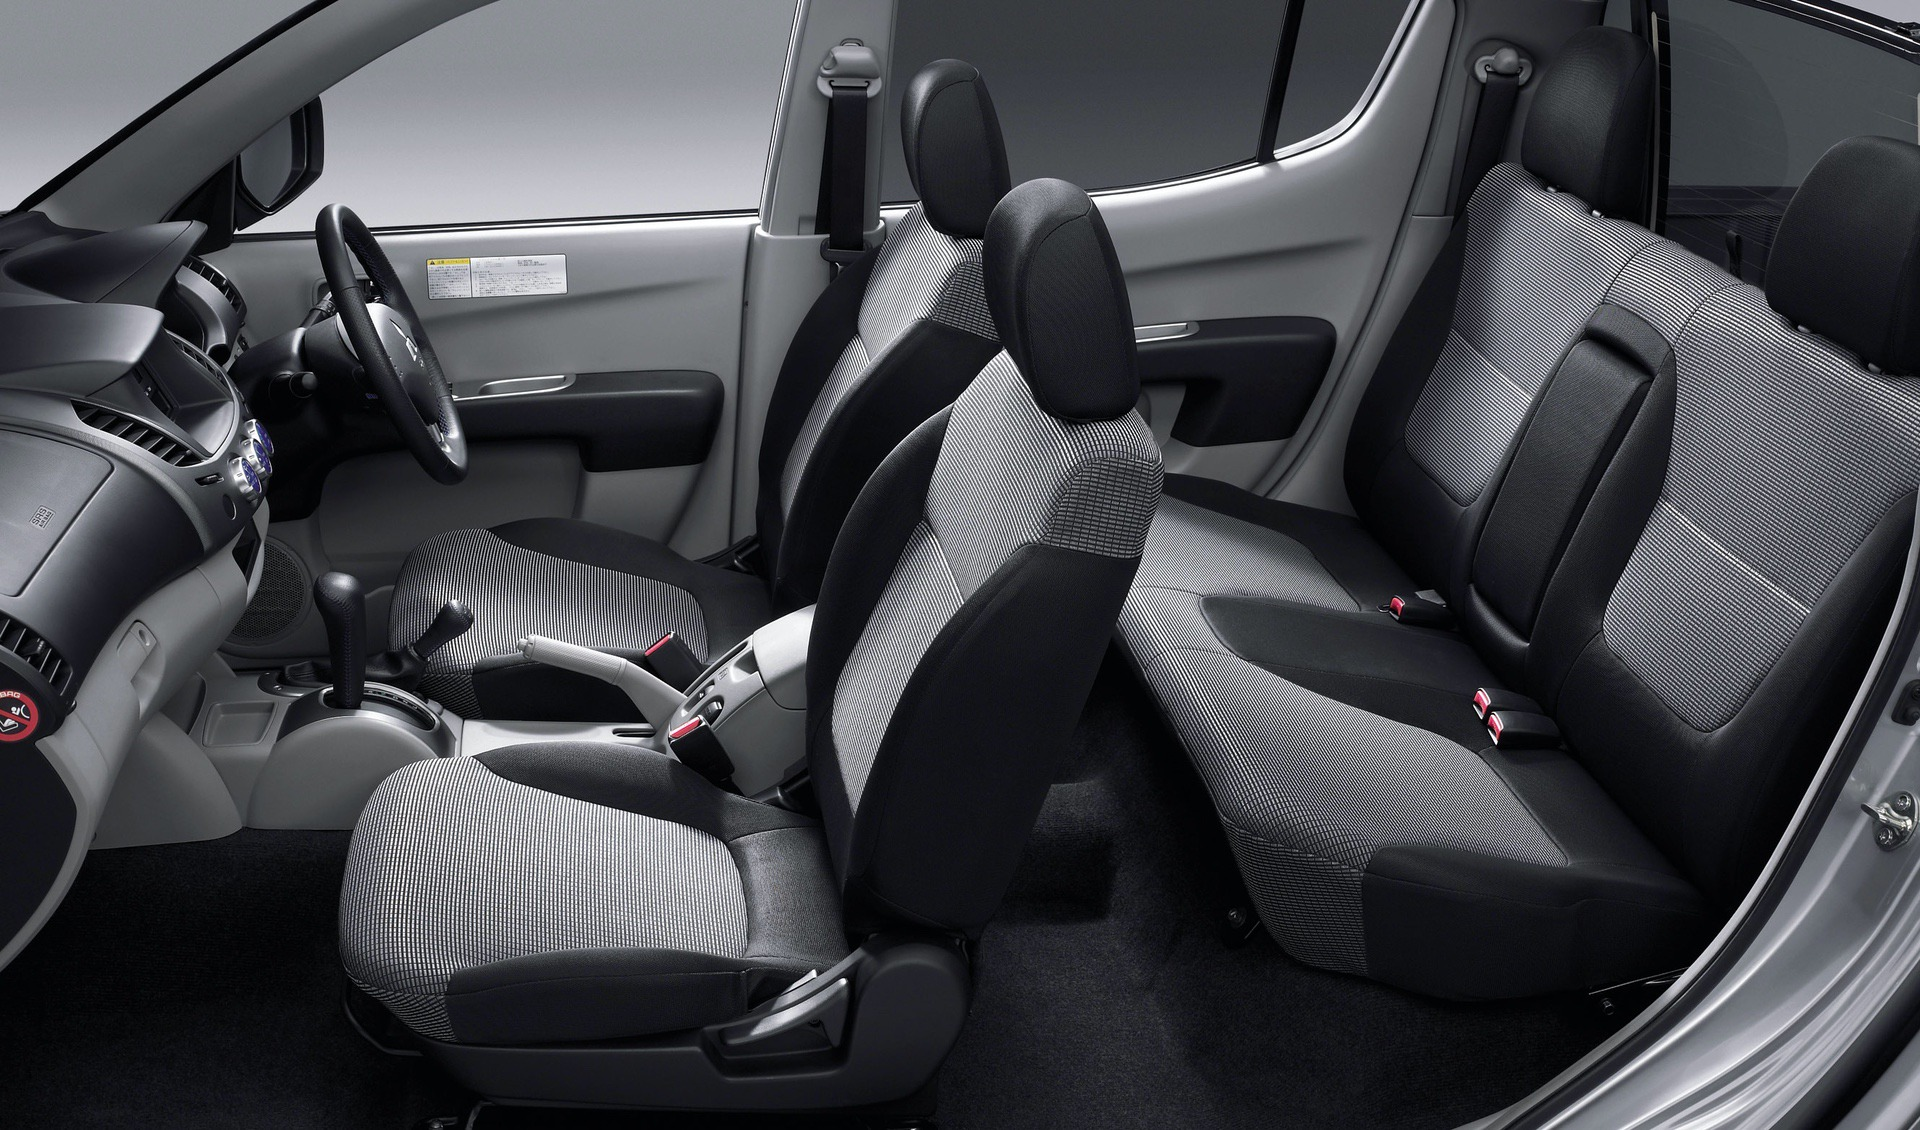 First_Drive_Mitsubishi_L200_0224